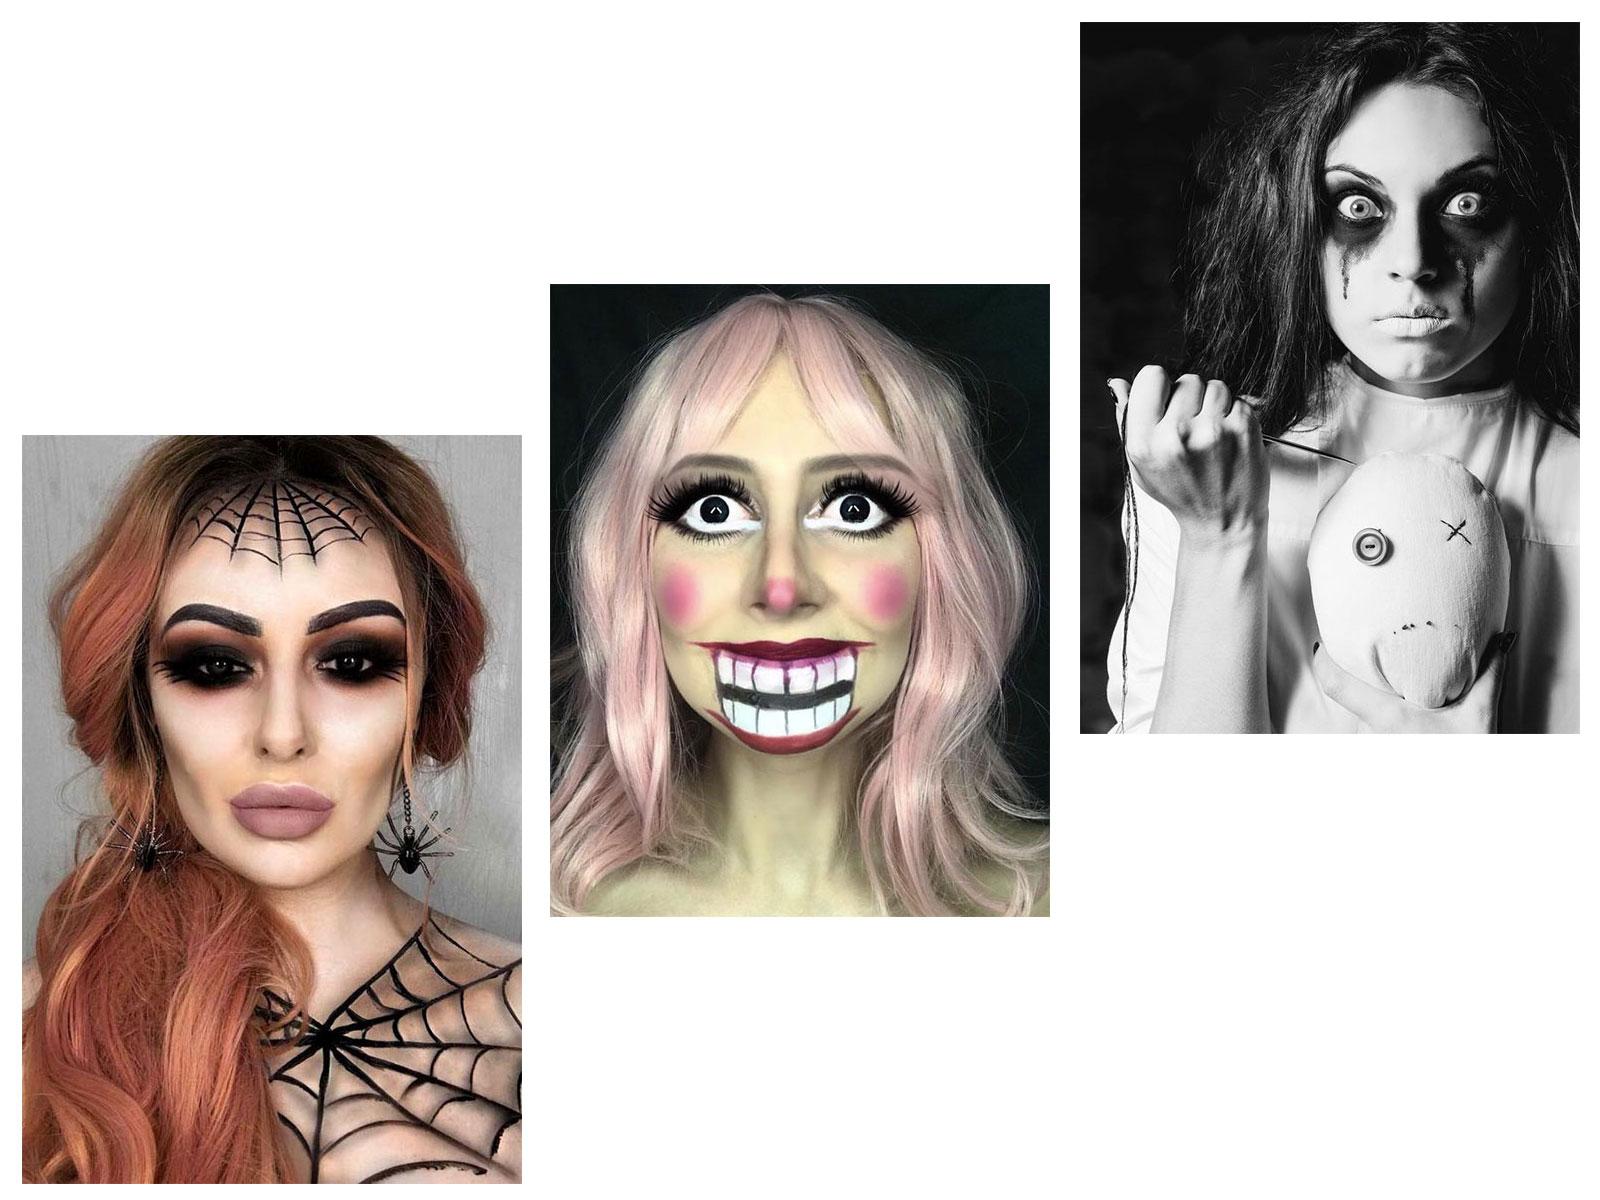 25-Best-Halloween-Face-Paint-Ideas-Looks-For-Kids-Men-Women-2019-F